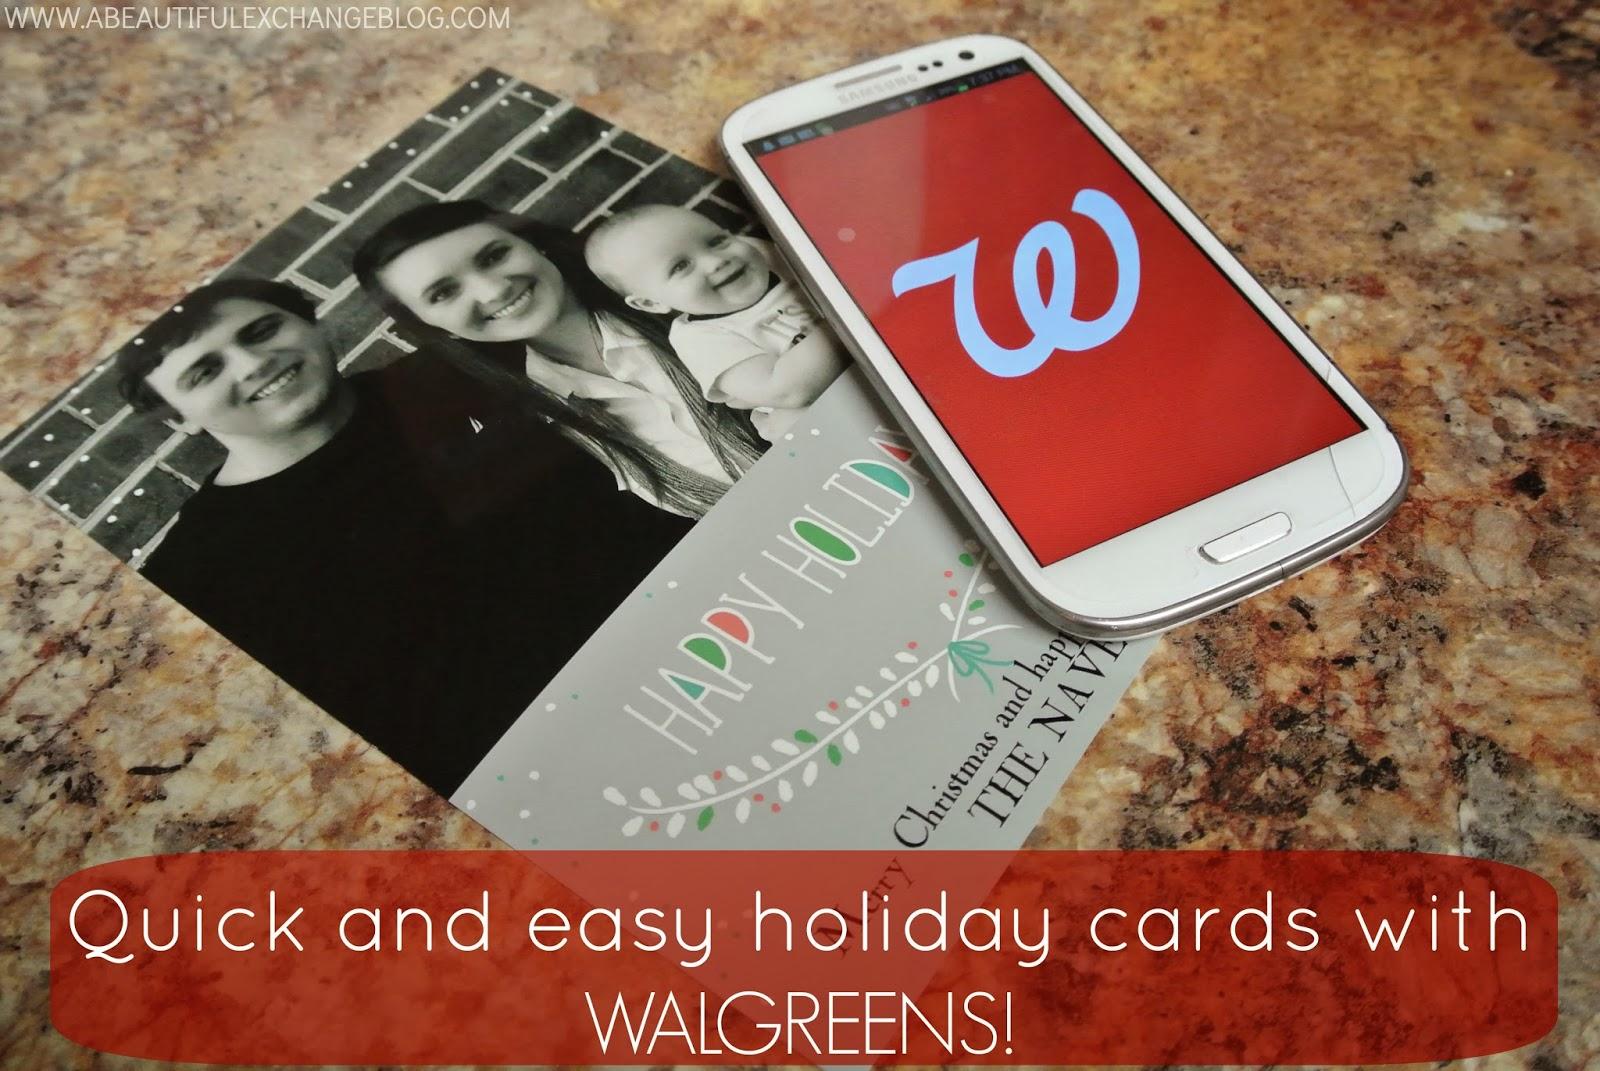 23shop holiday cards from walgreens walgreens app cheap holiday CgglbAP4